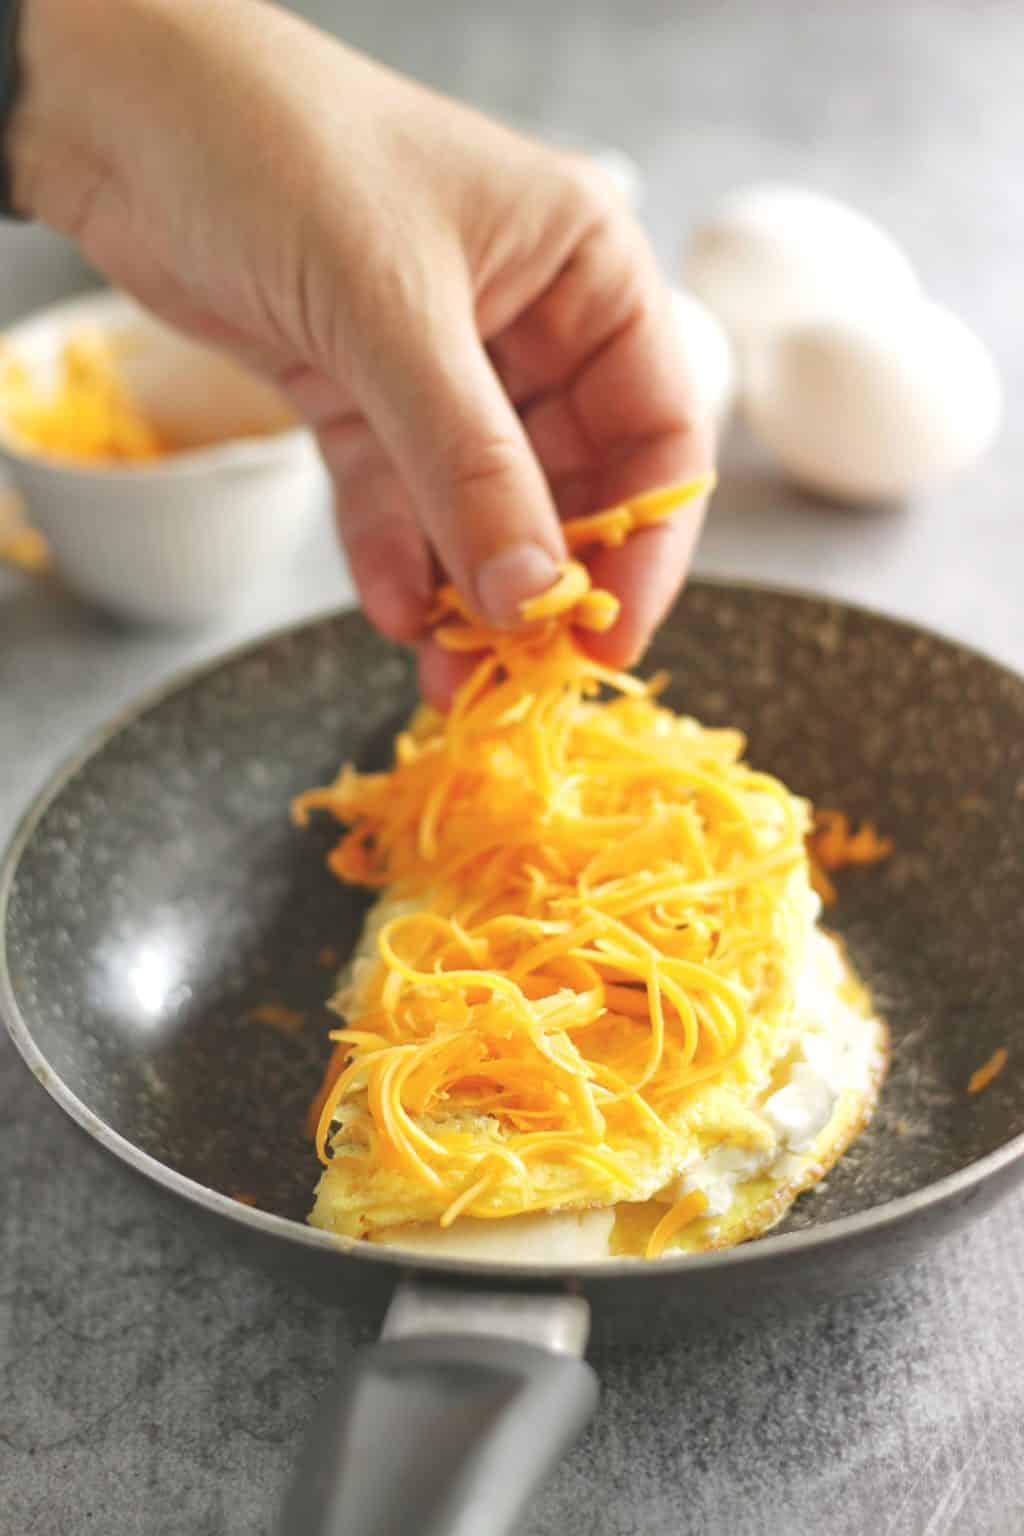 Jalapeño Cream Cheese Omelette